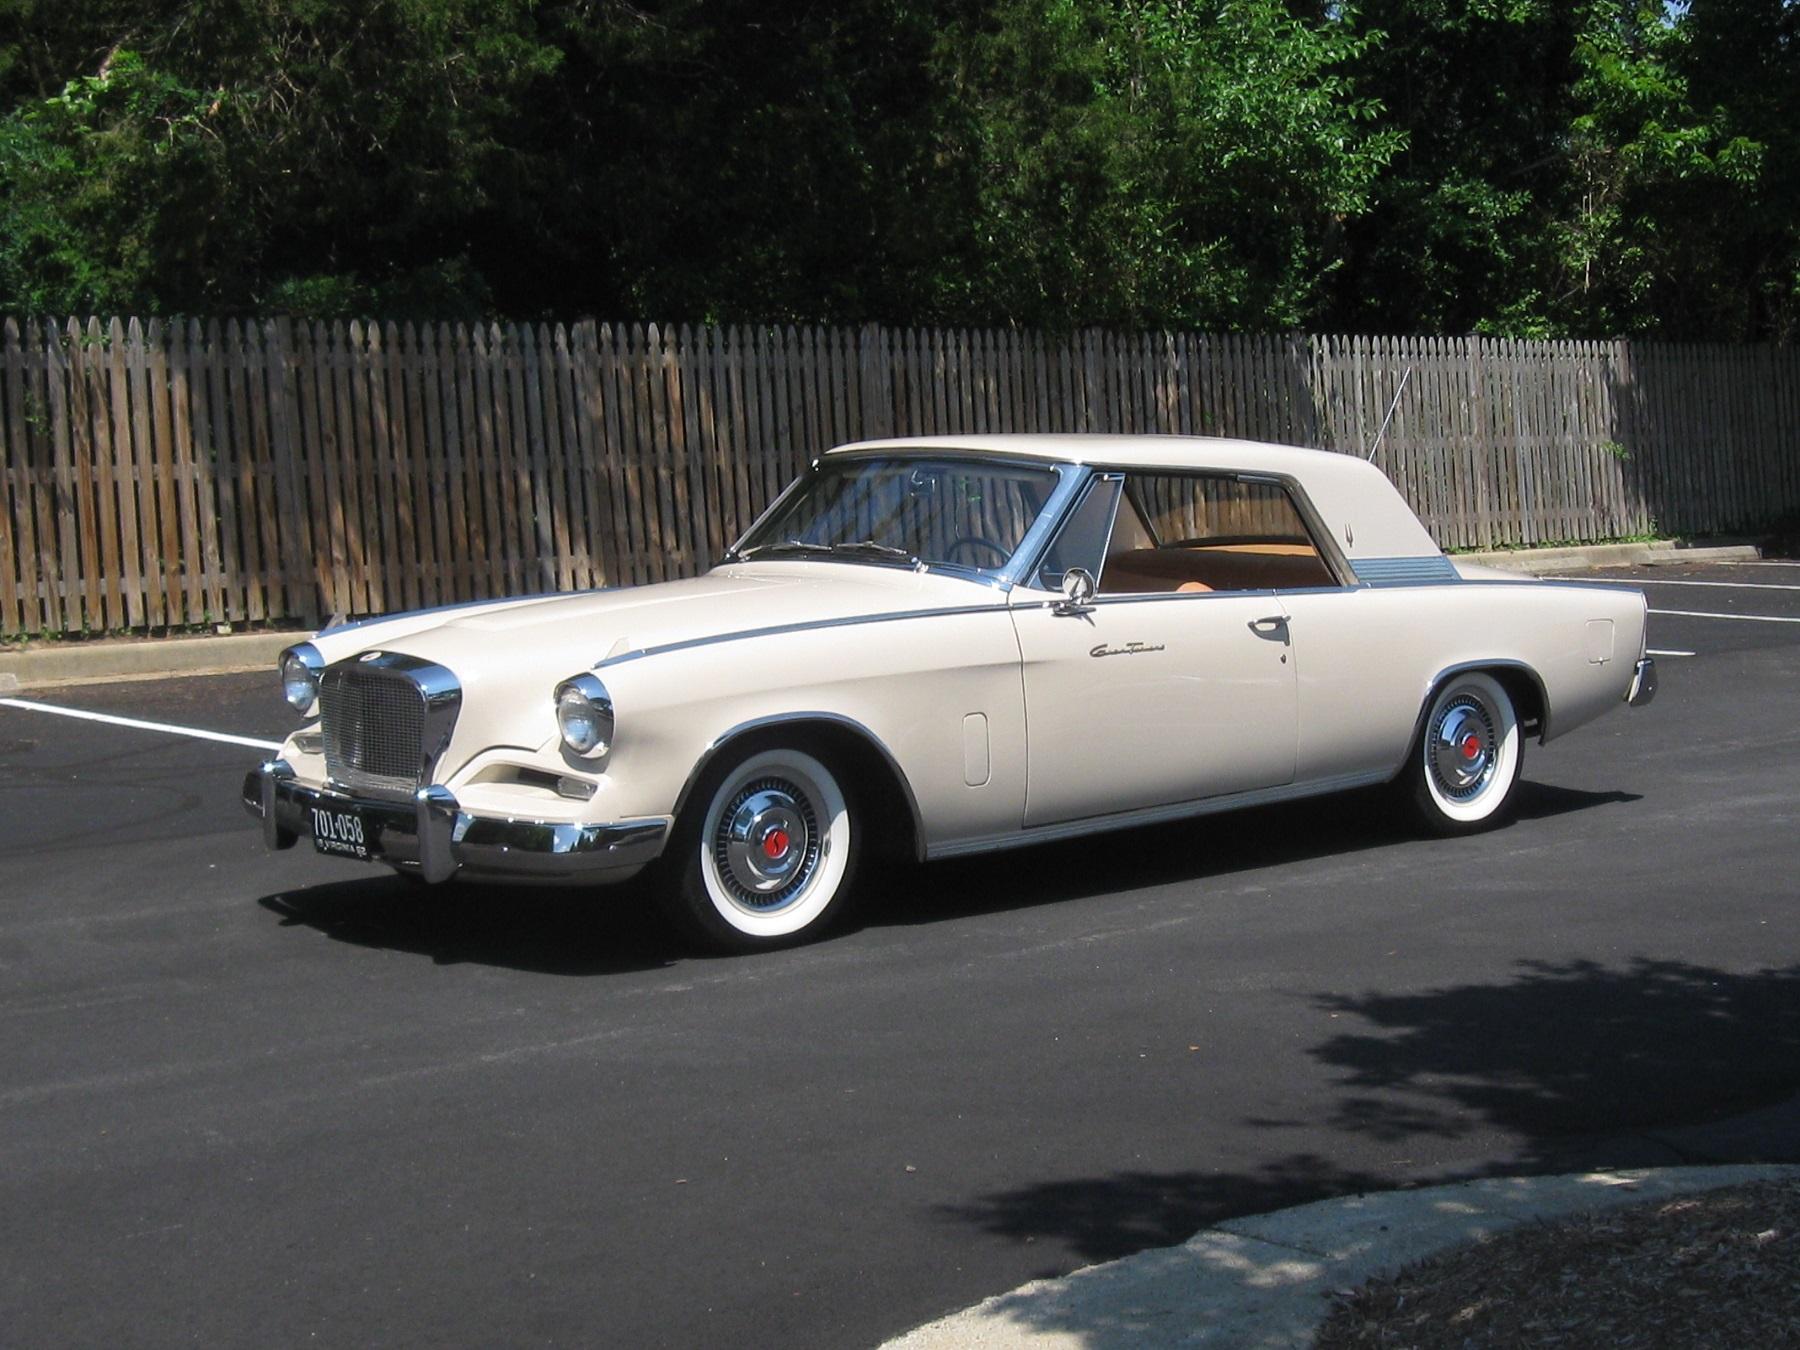 Dorable Nada Old Cars Ensign - Classic Cars Ideas - boiq.info